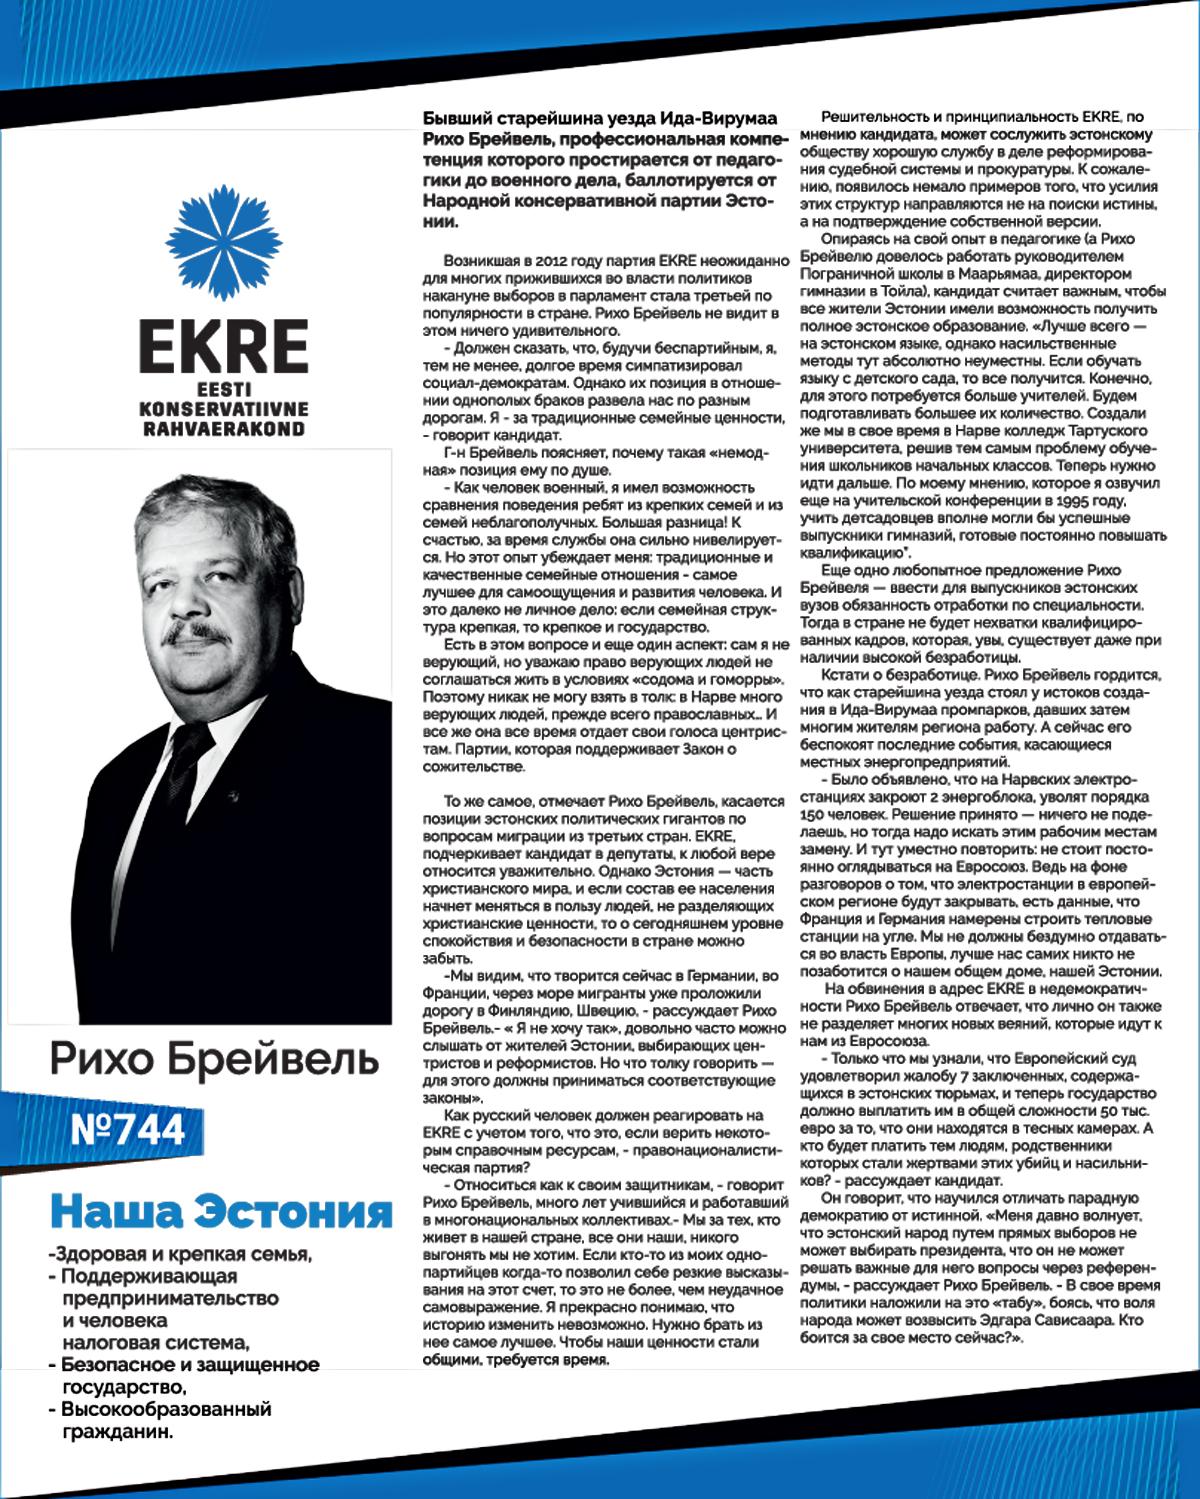 EKRE (744 RIHO BREIVEL Ида-Вирумаа)